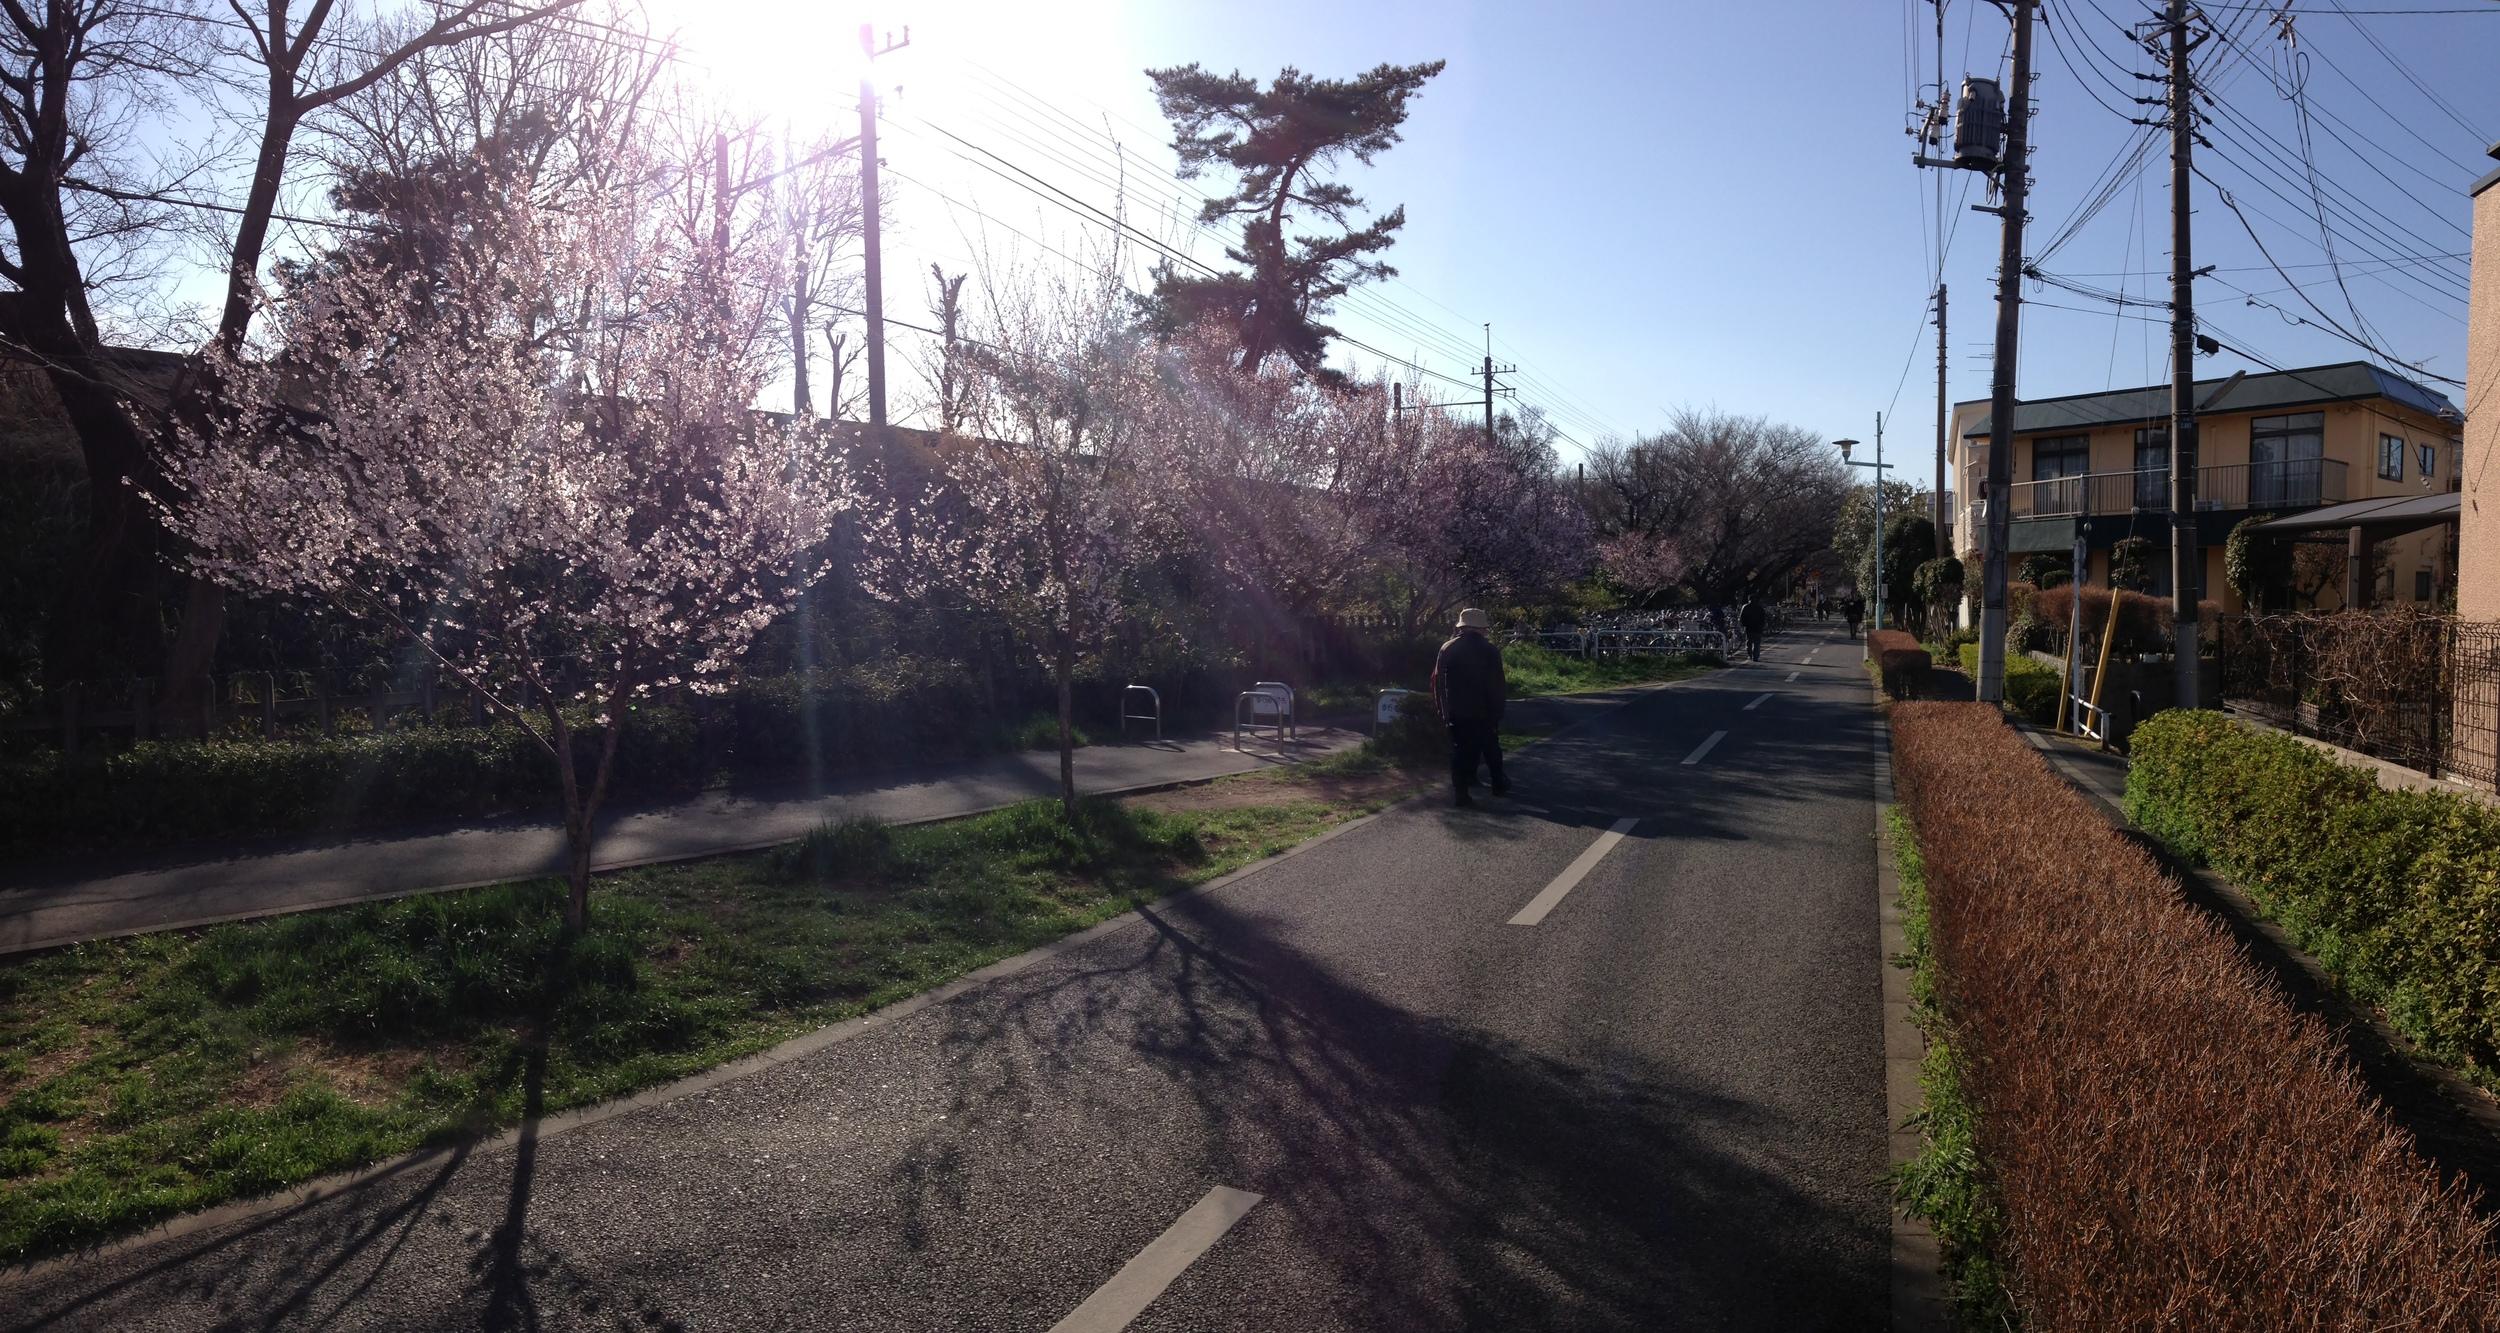 Sakura! 桜!